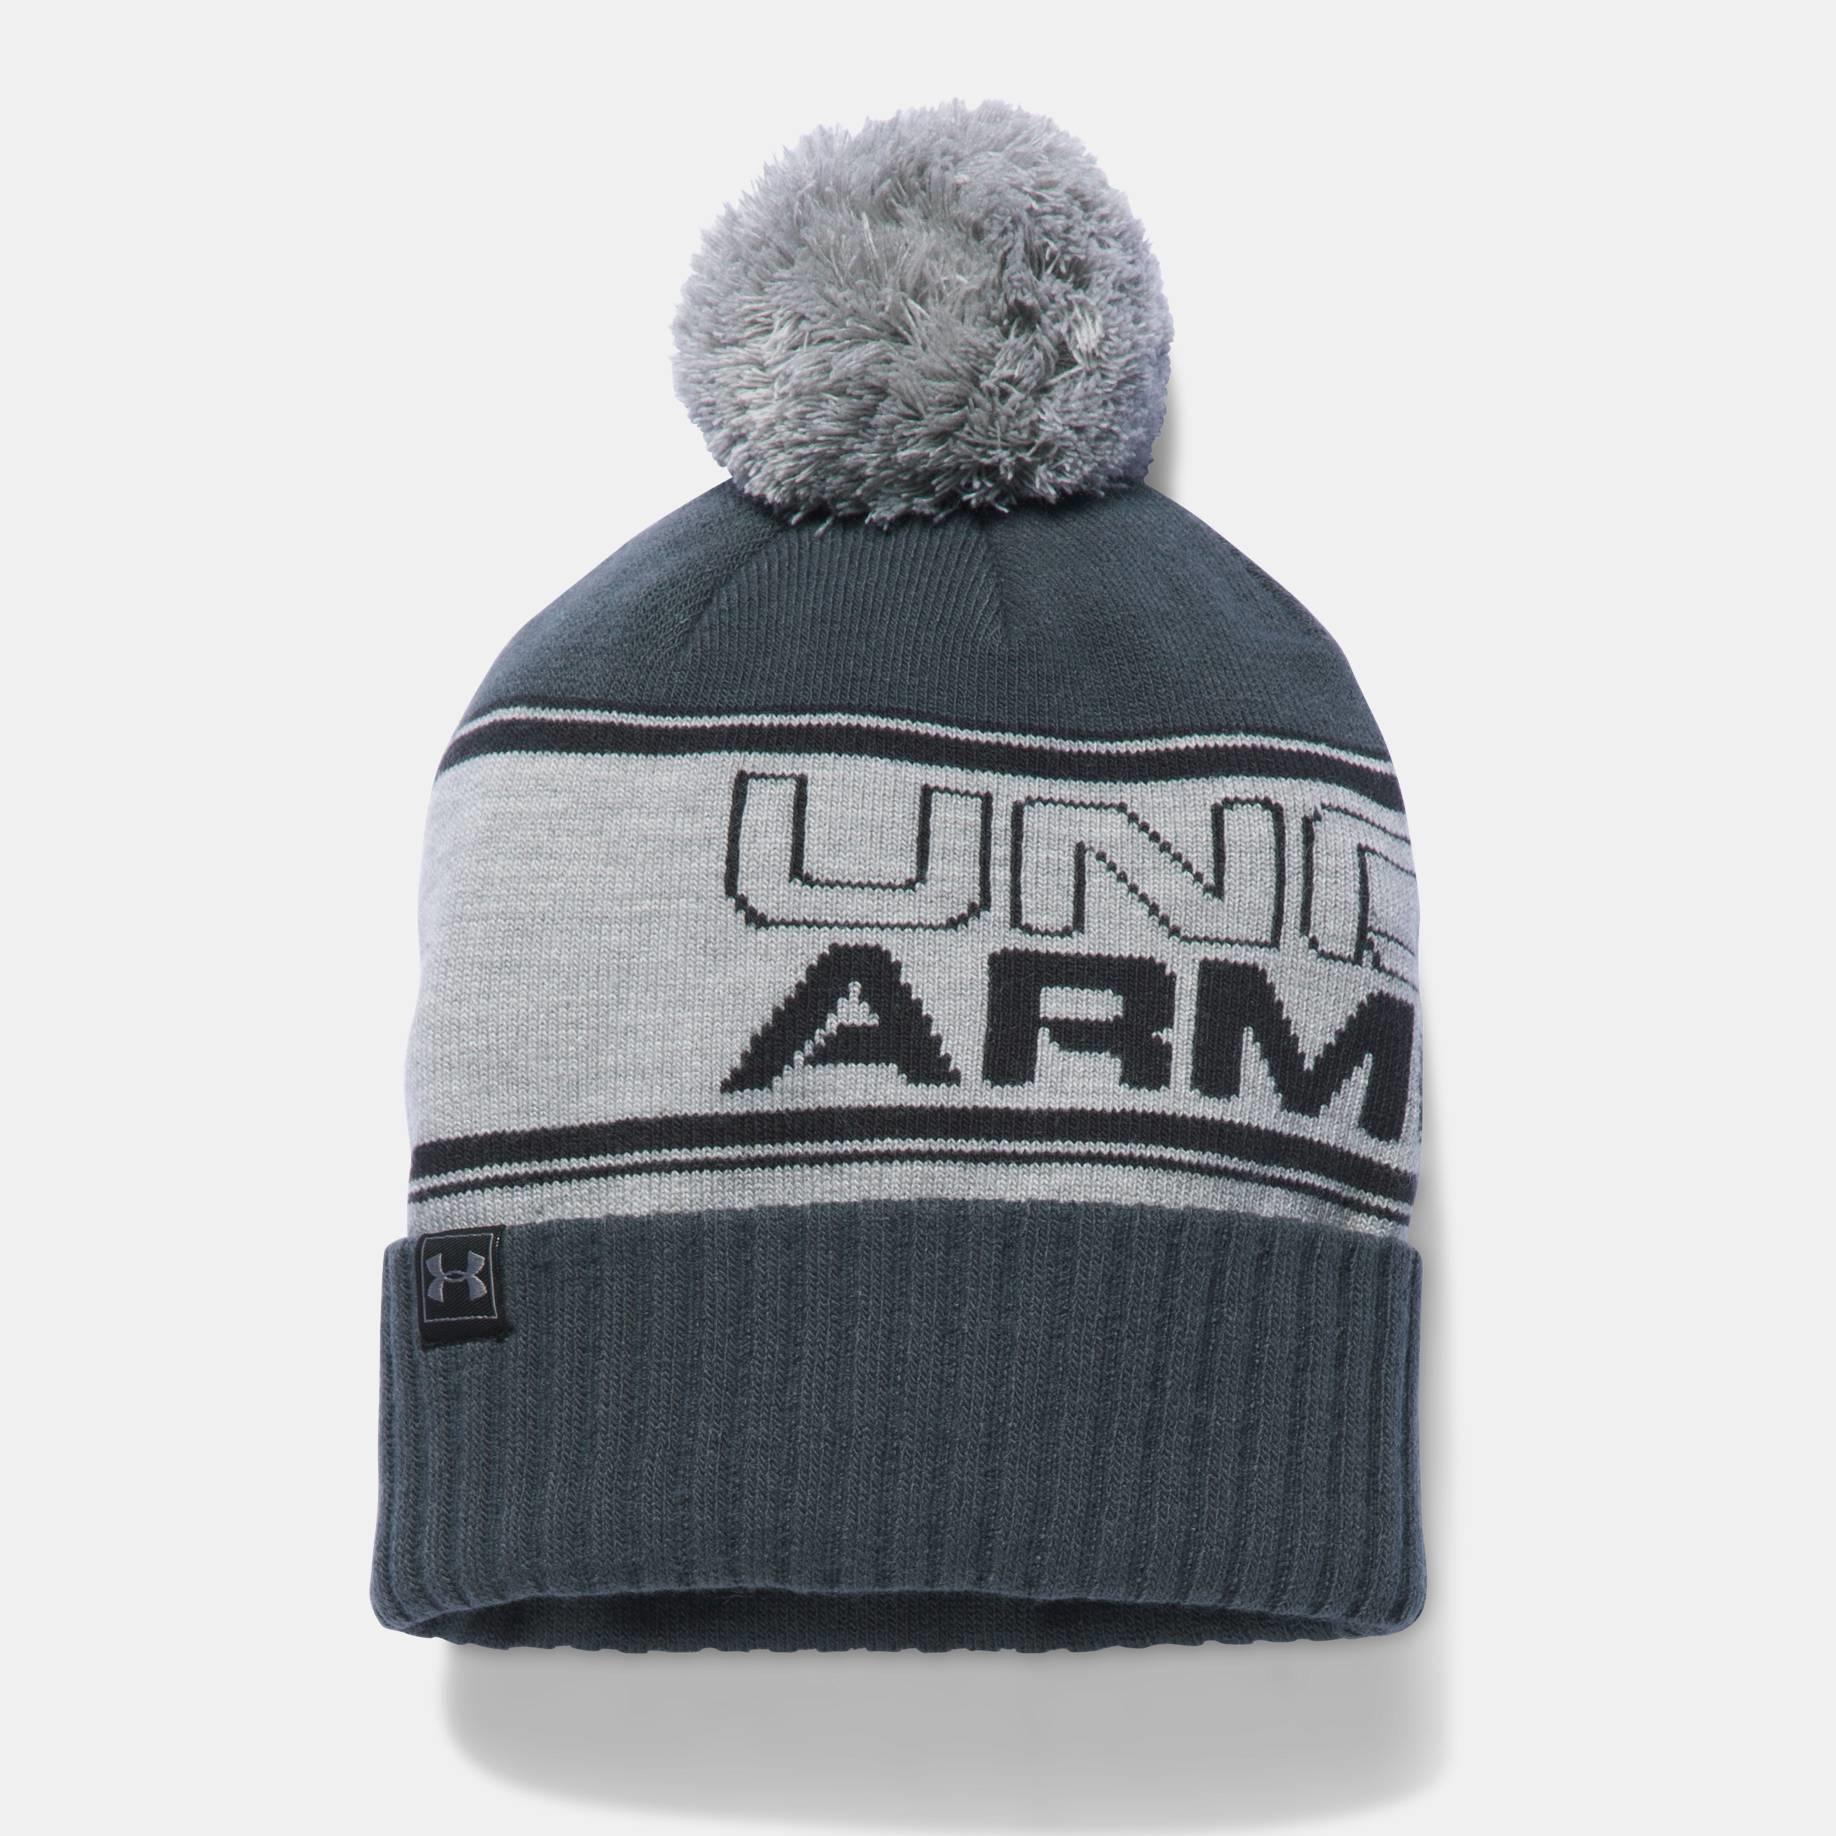 44d56279b10 Accessories - under armour Retro Pom Beanie   Fitness